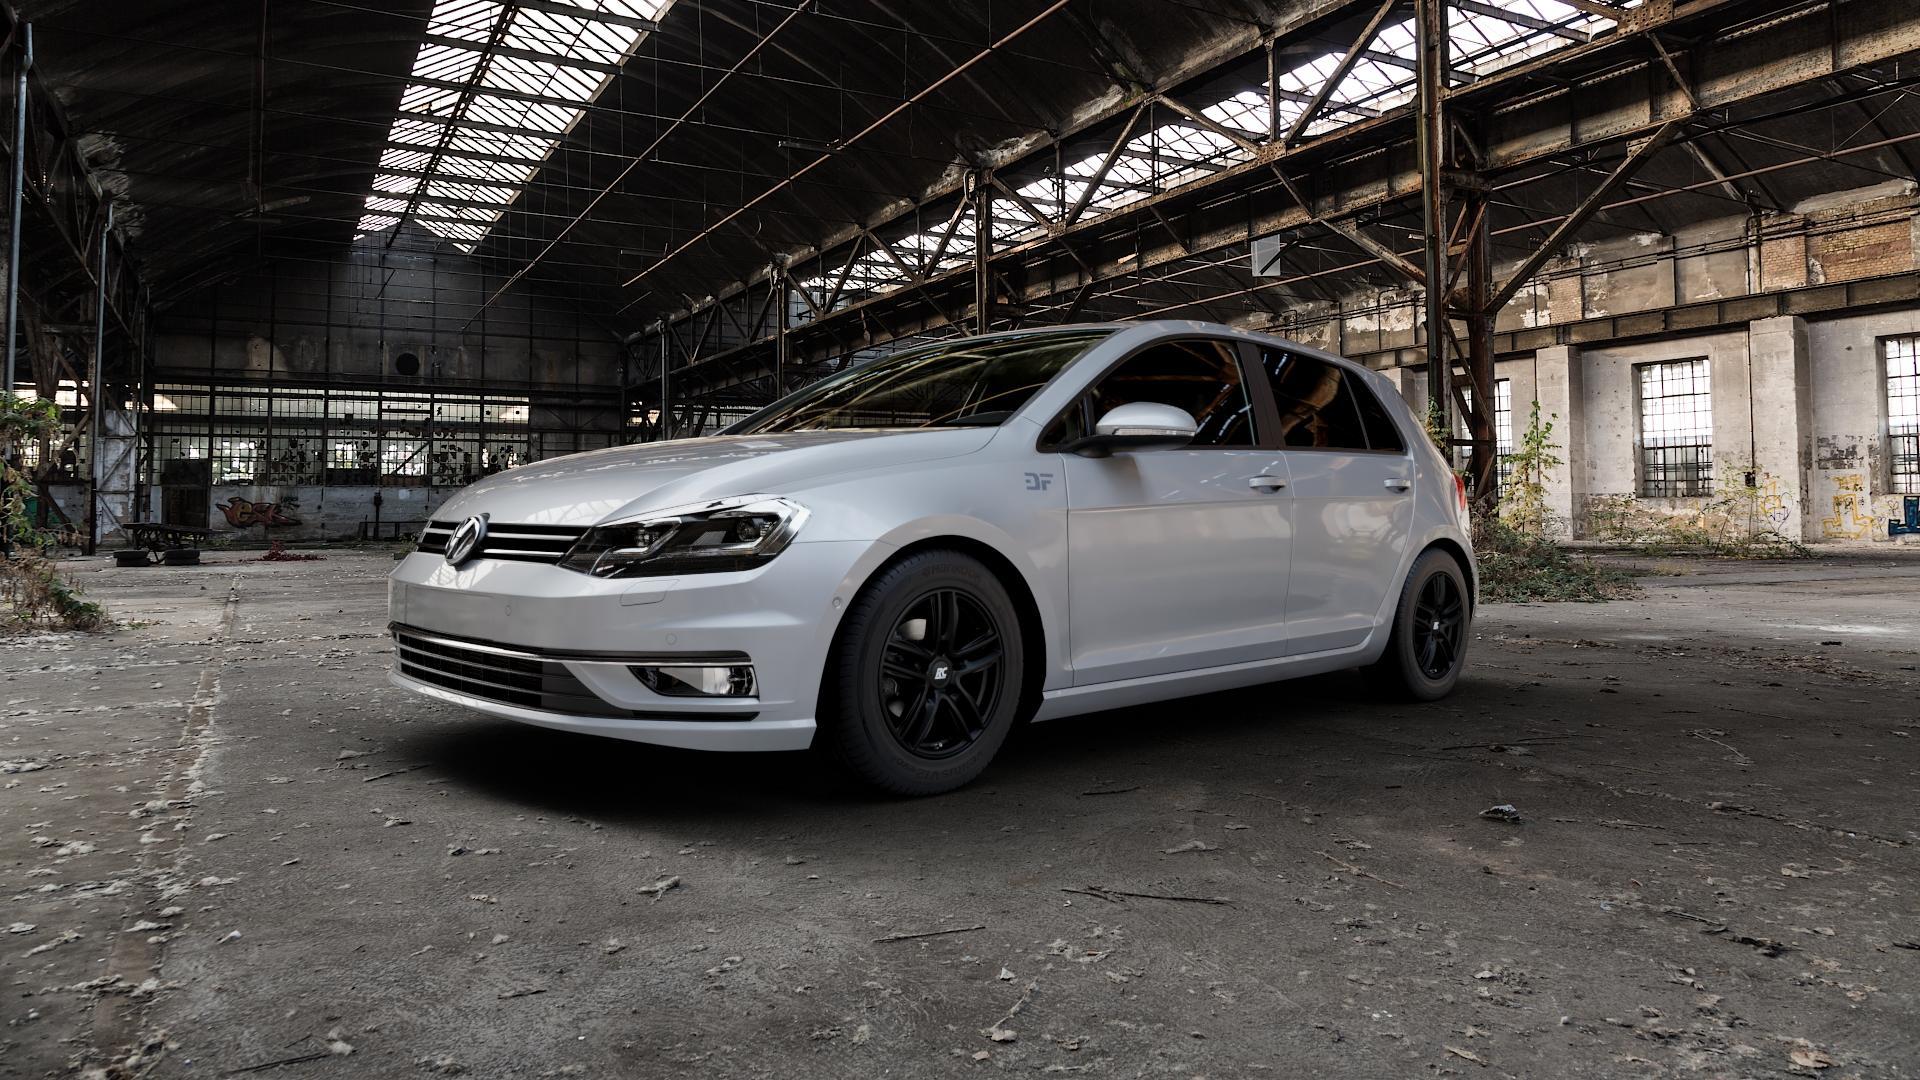 RC Design RC27 schwarz-matt lackiert Felge mit Reifen in 15Zoll Winterfelge Alufelge auf silbernem Volkswagen (VW) Golf 7 Facelift 1,0l TSI 63kW (86 PS) 2,0l TDI 110kW (150 1,6l 66kW (90 1,4l 92kW (125 EcoFuel 85kW (116 81kW (110 TGI 4Motion 1,5l 96kW (131 ⬇️ mit 15mm Tieferlegung ⬇️ Industriehalle 1 Camera_000